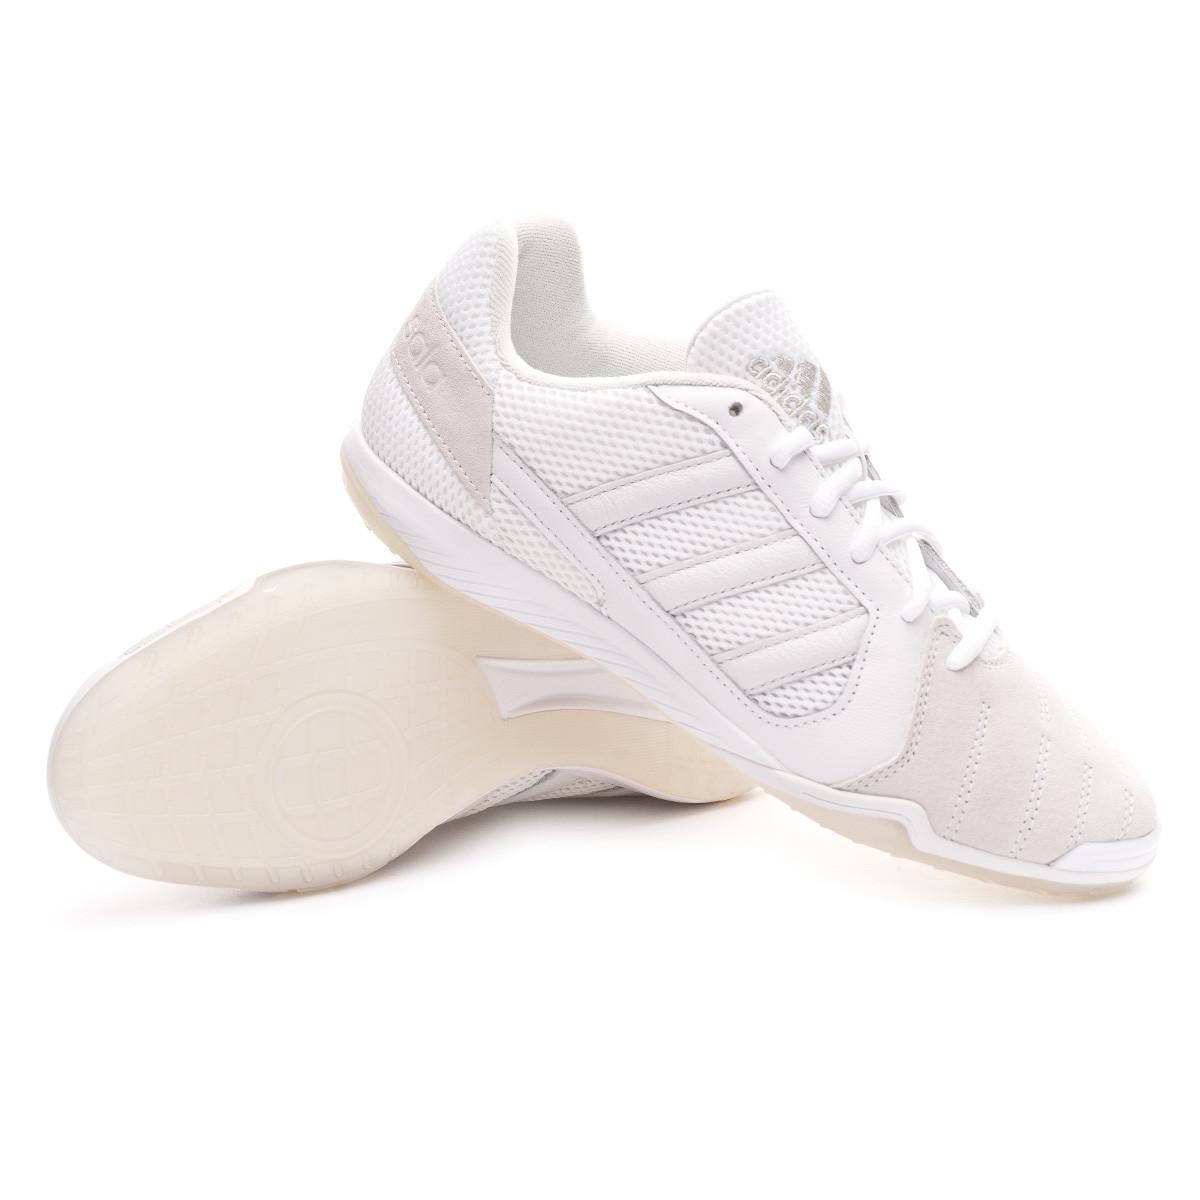 Futsal Boot adidas Top Sala Lux White